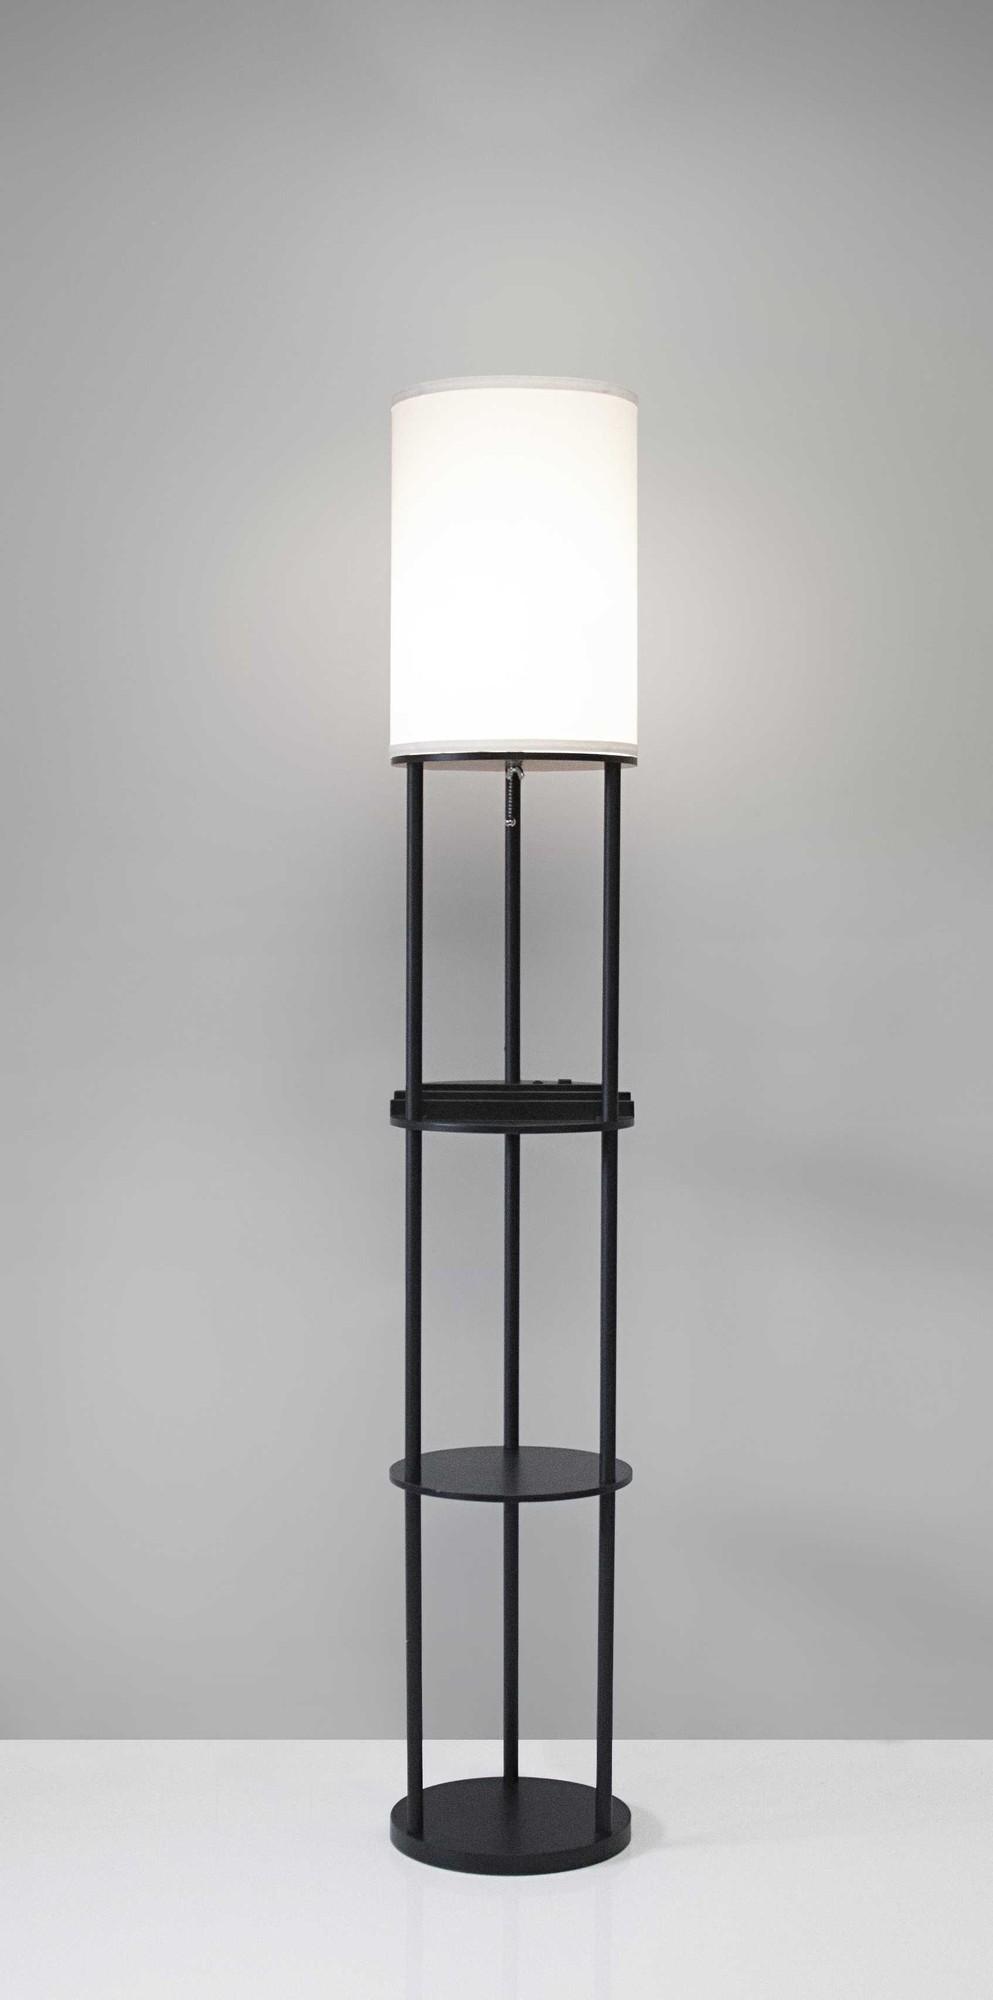 "11"" X 11"" X 66.5"" Black Wood Station Shelf Floor Lamp"